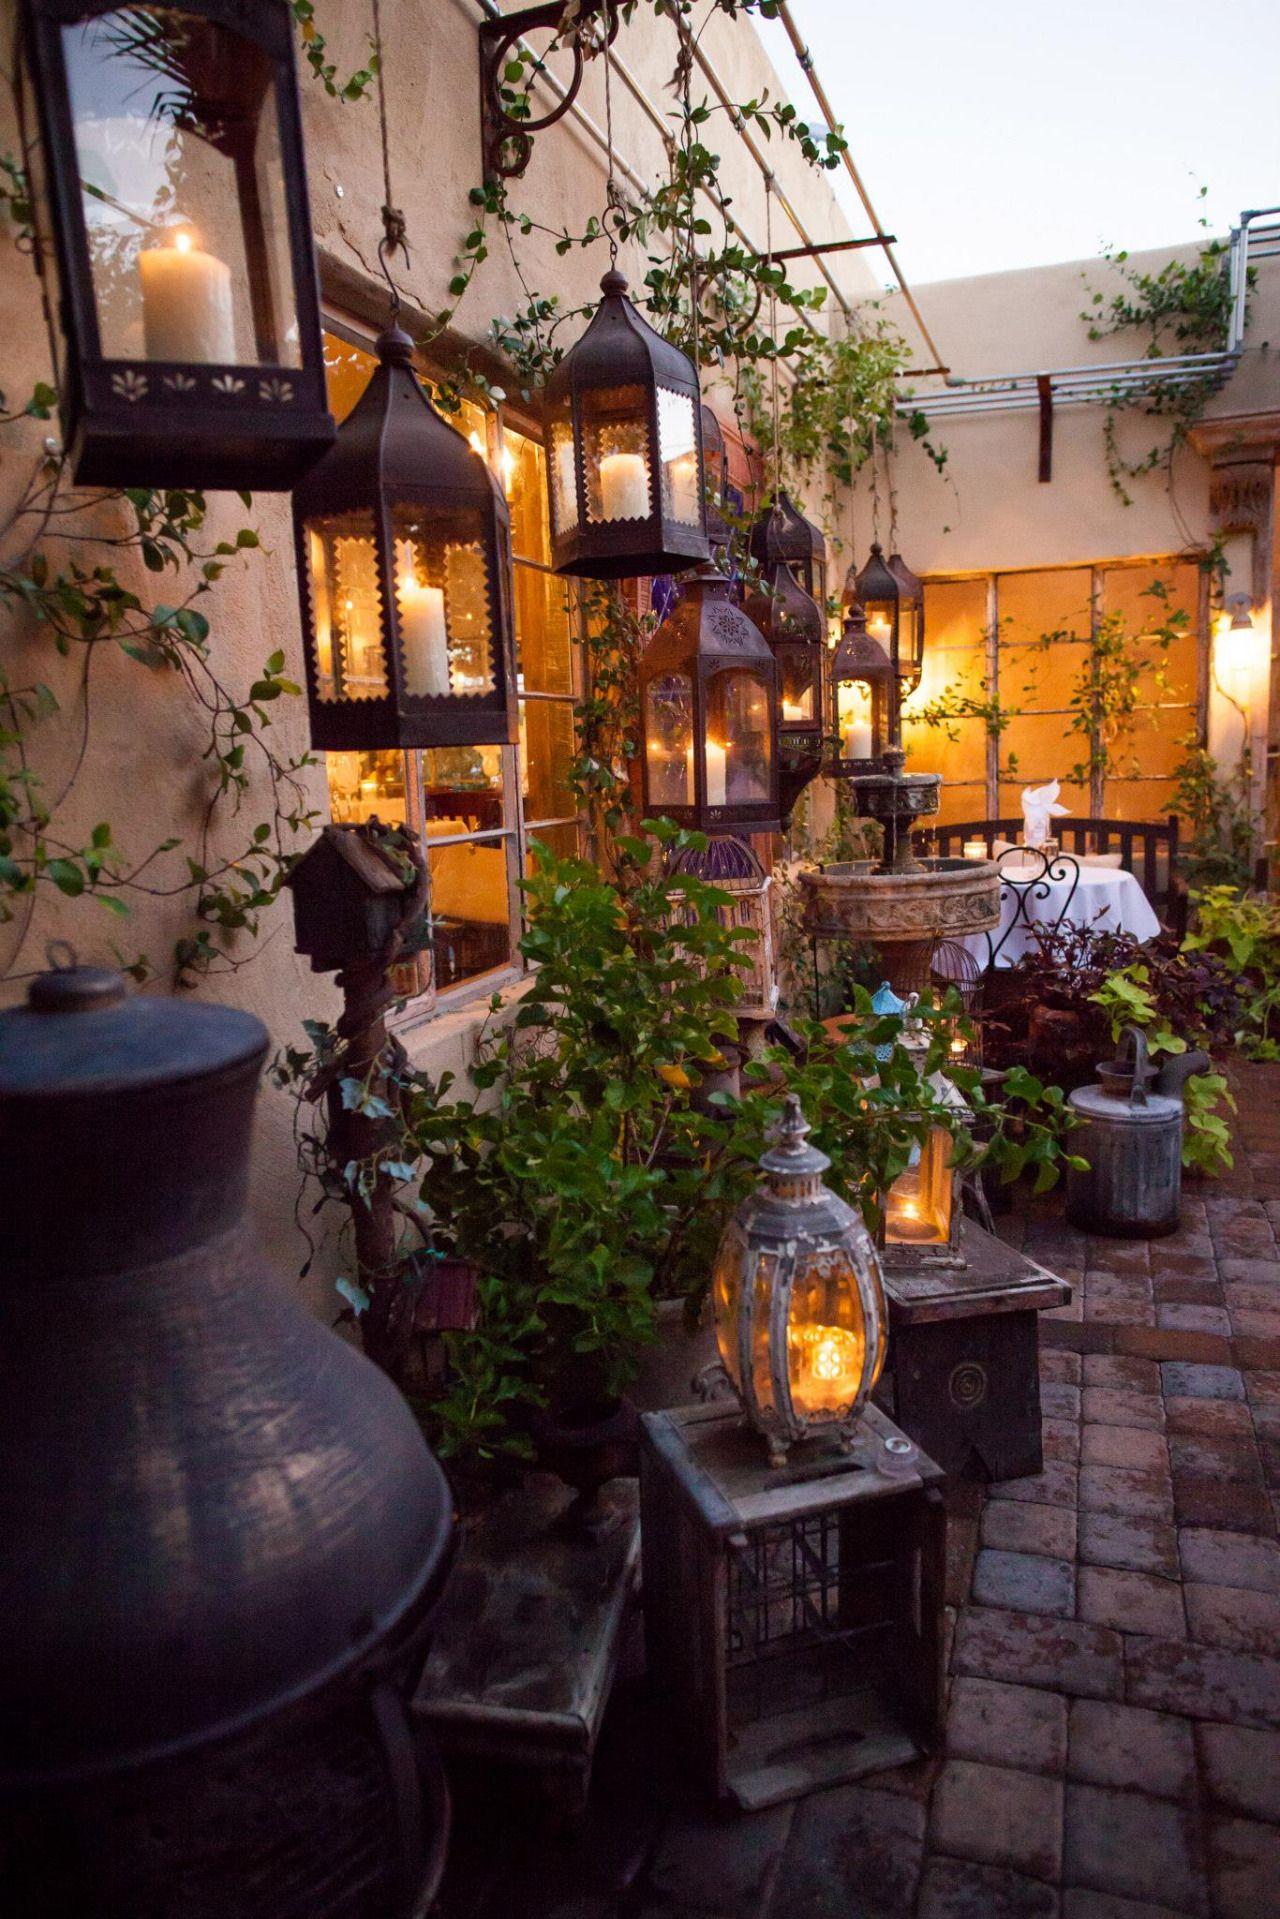 Cafe Monarch Scottsdale, AZ | Scottsdale Restaurants | Pinterest ...